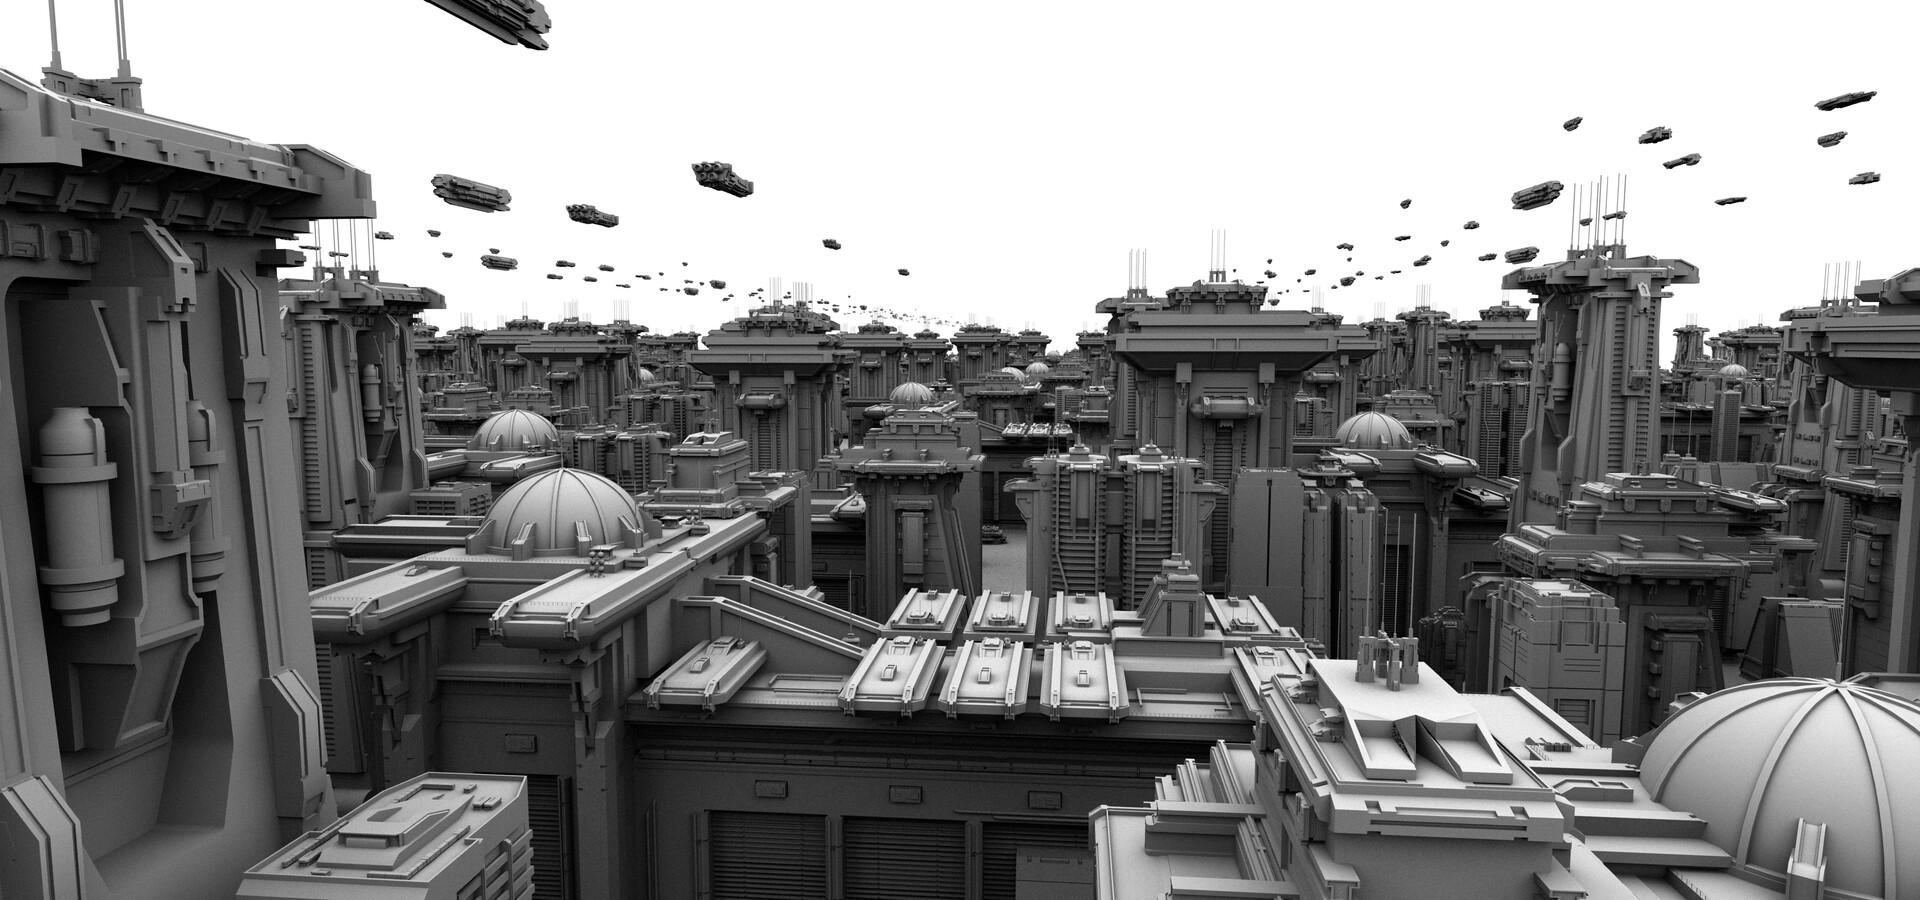 Kevin jick kitbashset1 buildings replicatortest render01c2